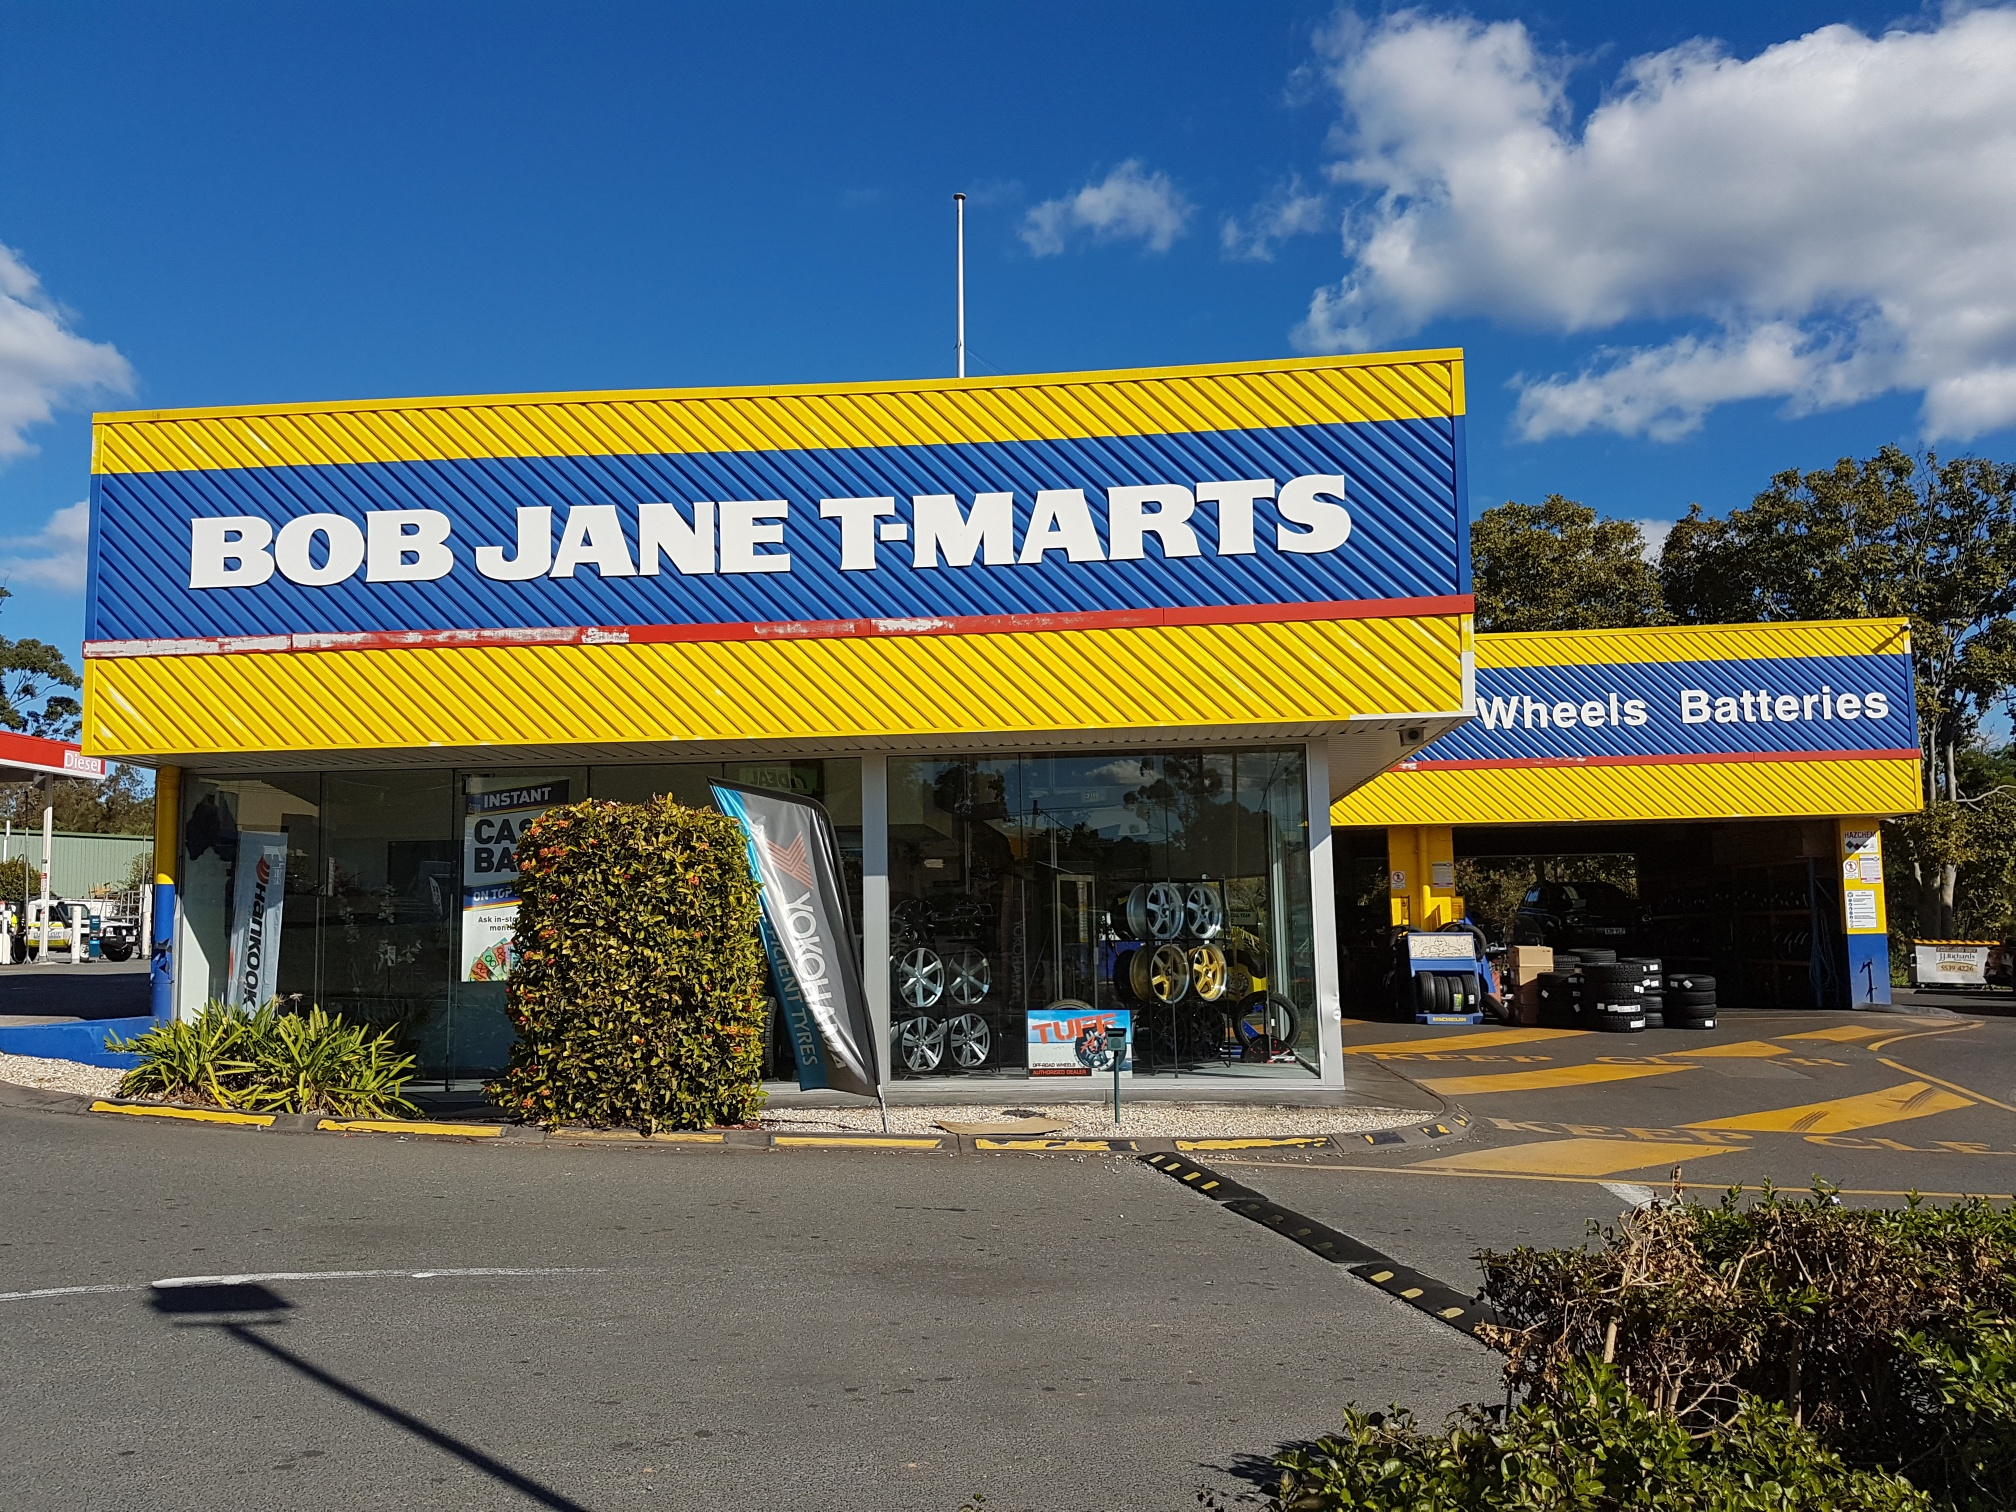 bob-jane-t-marts-nerang-franchise-opportunity-tyres-wheels-batteries-0